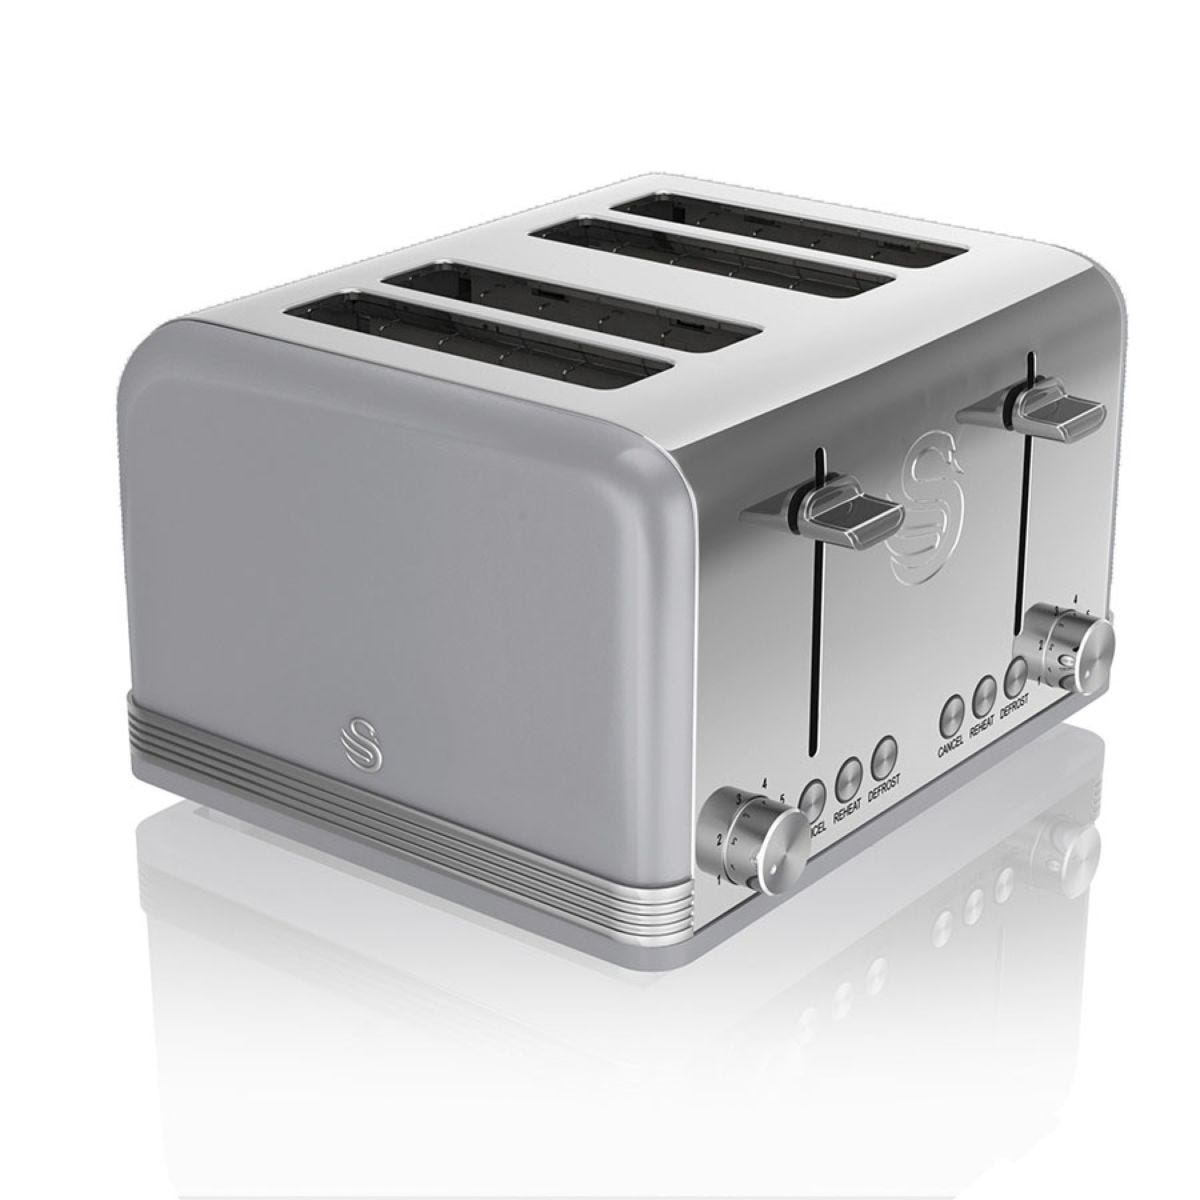 Swan ST19020GRN 4-Slice Retro Toaster - Grey